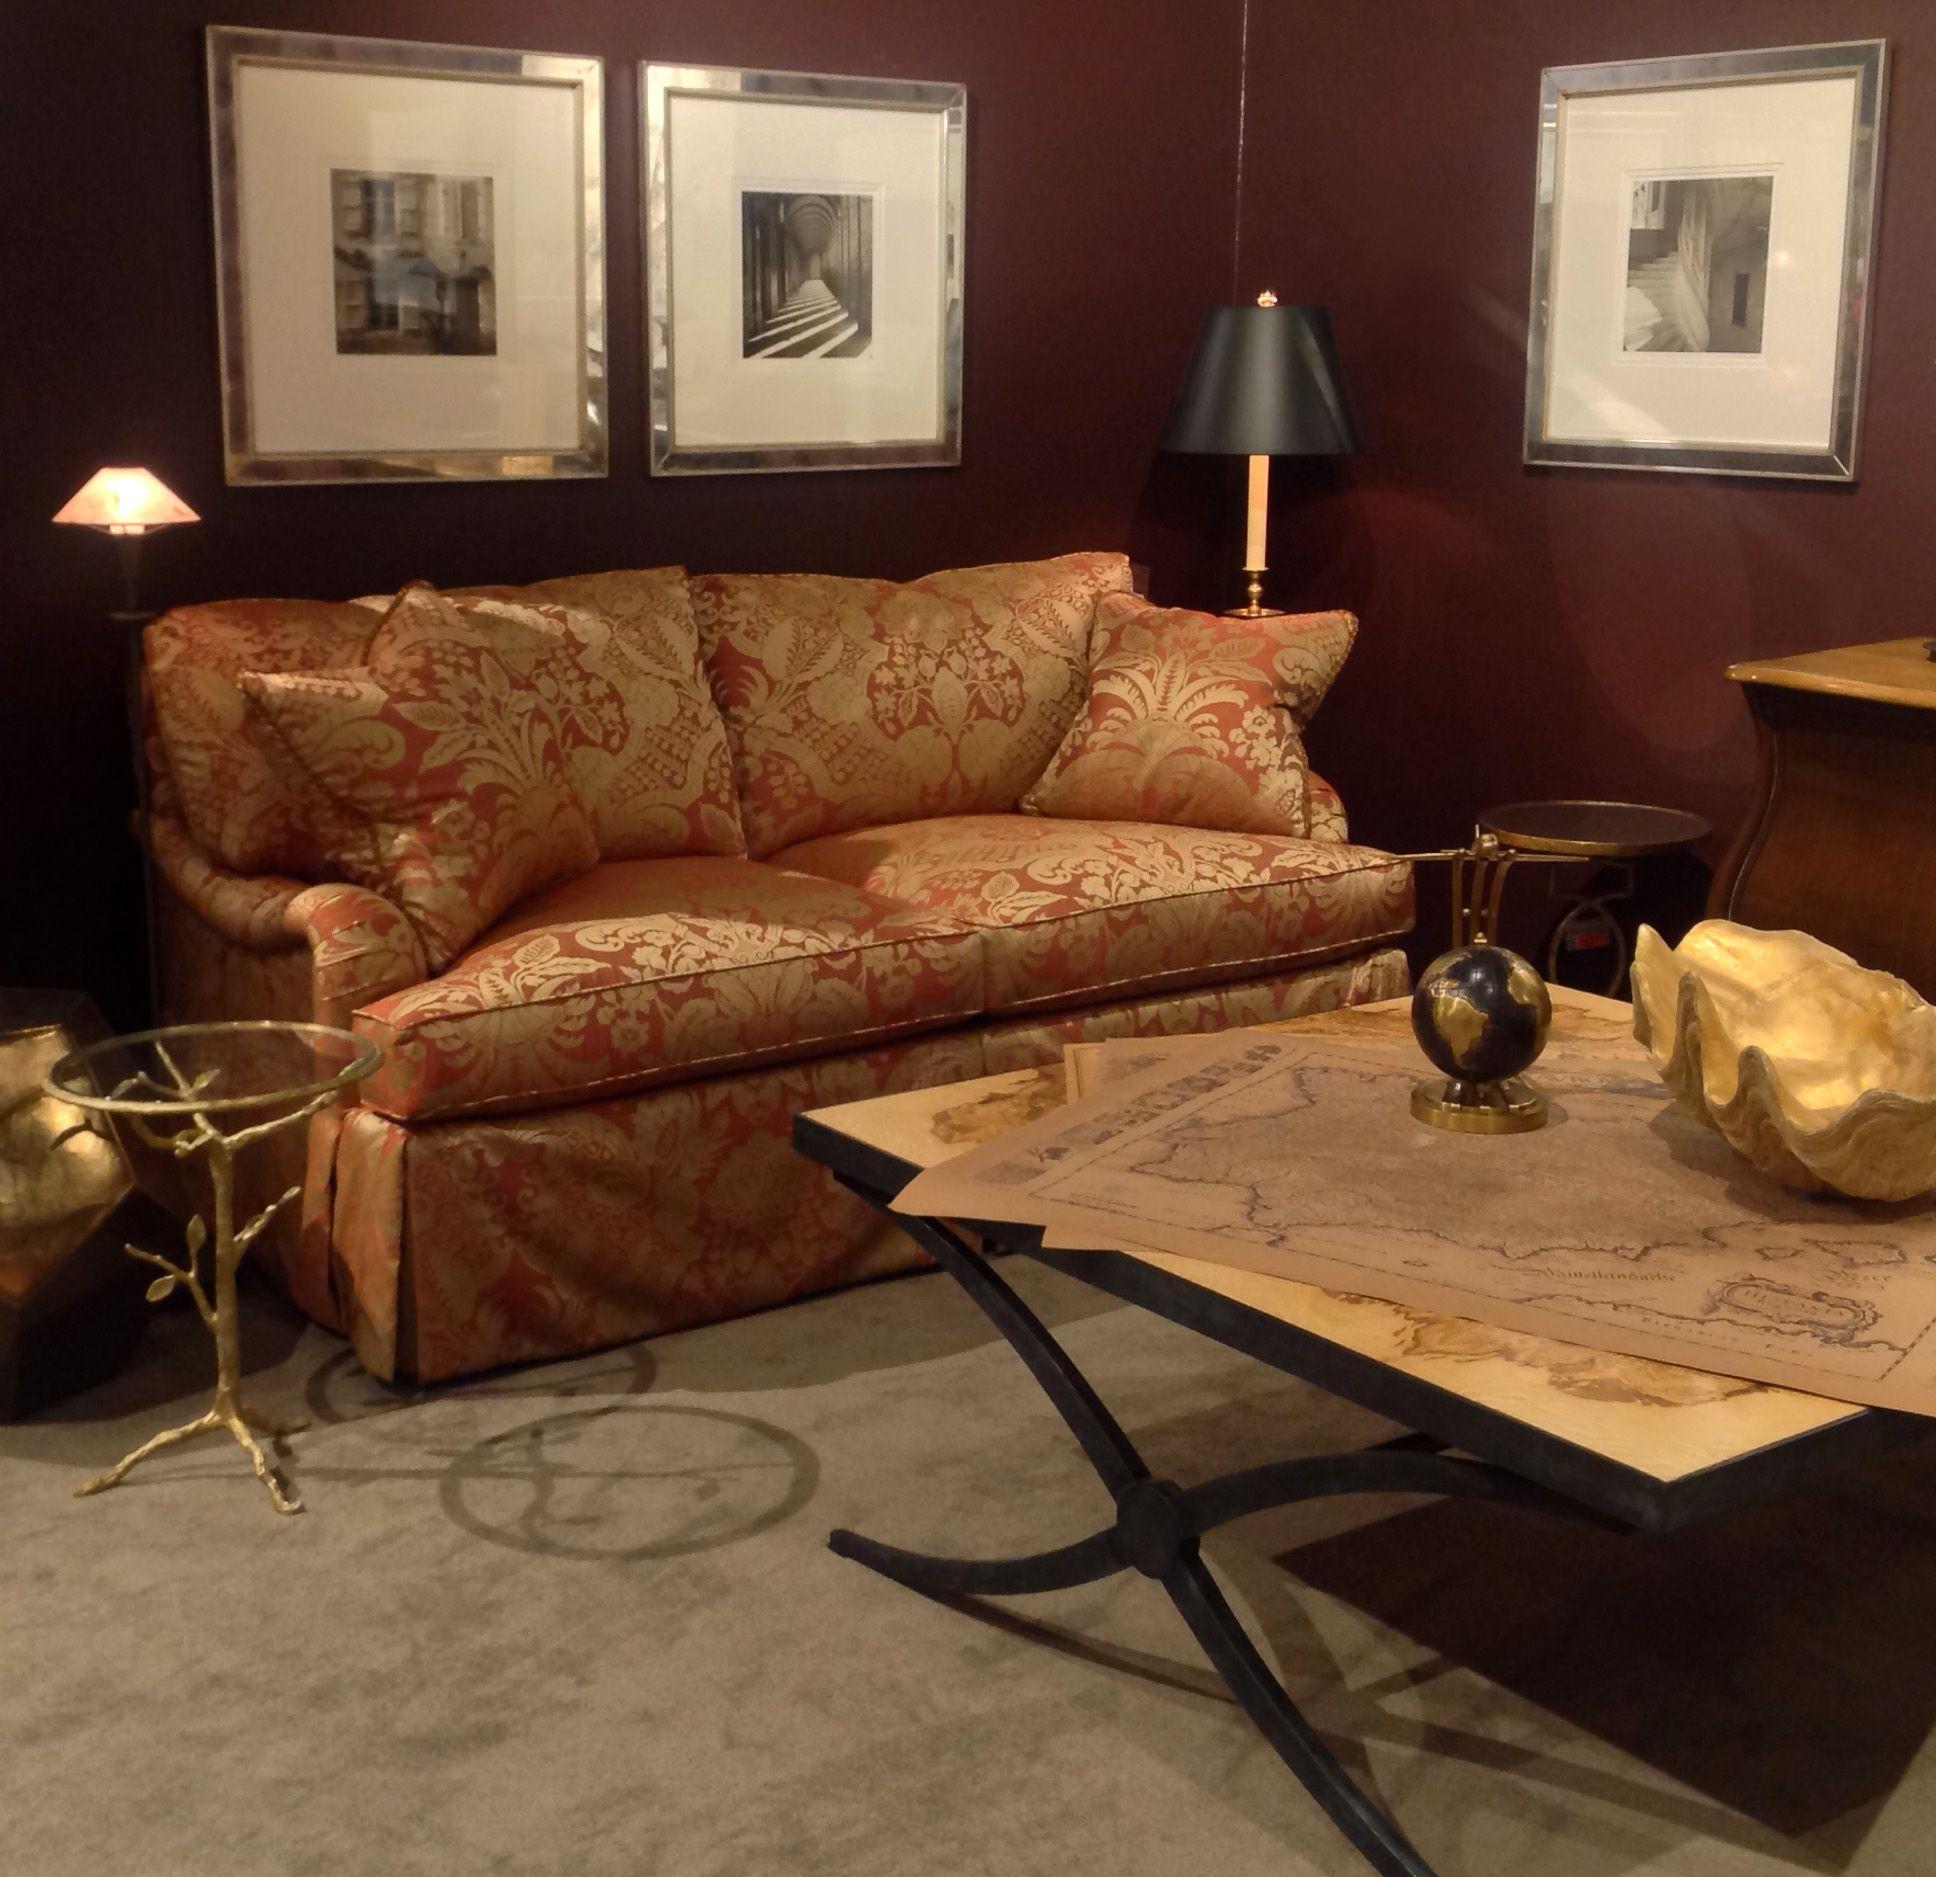 Charming Noriega Furniture Showroom Shots